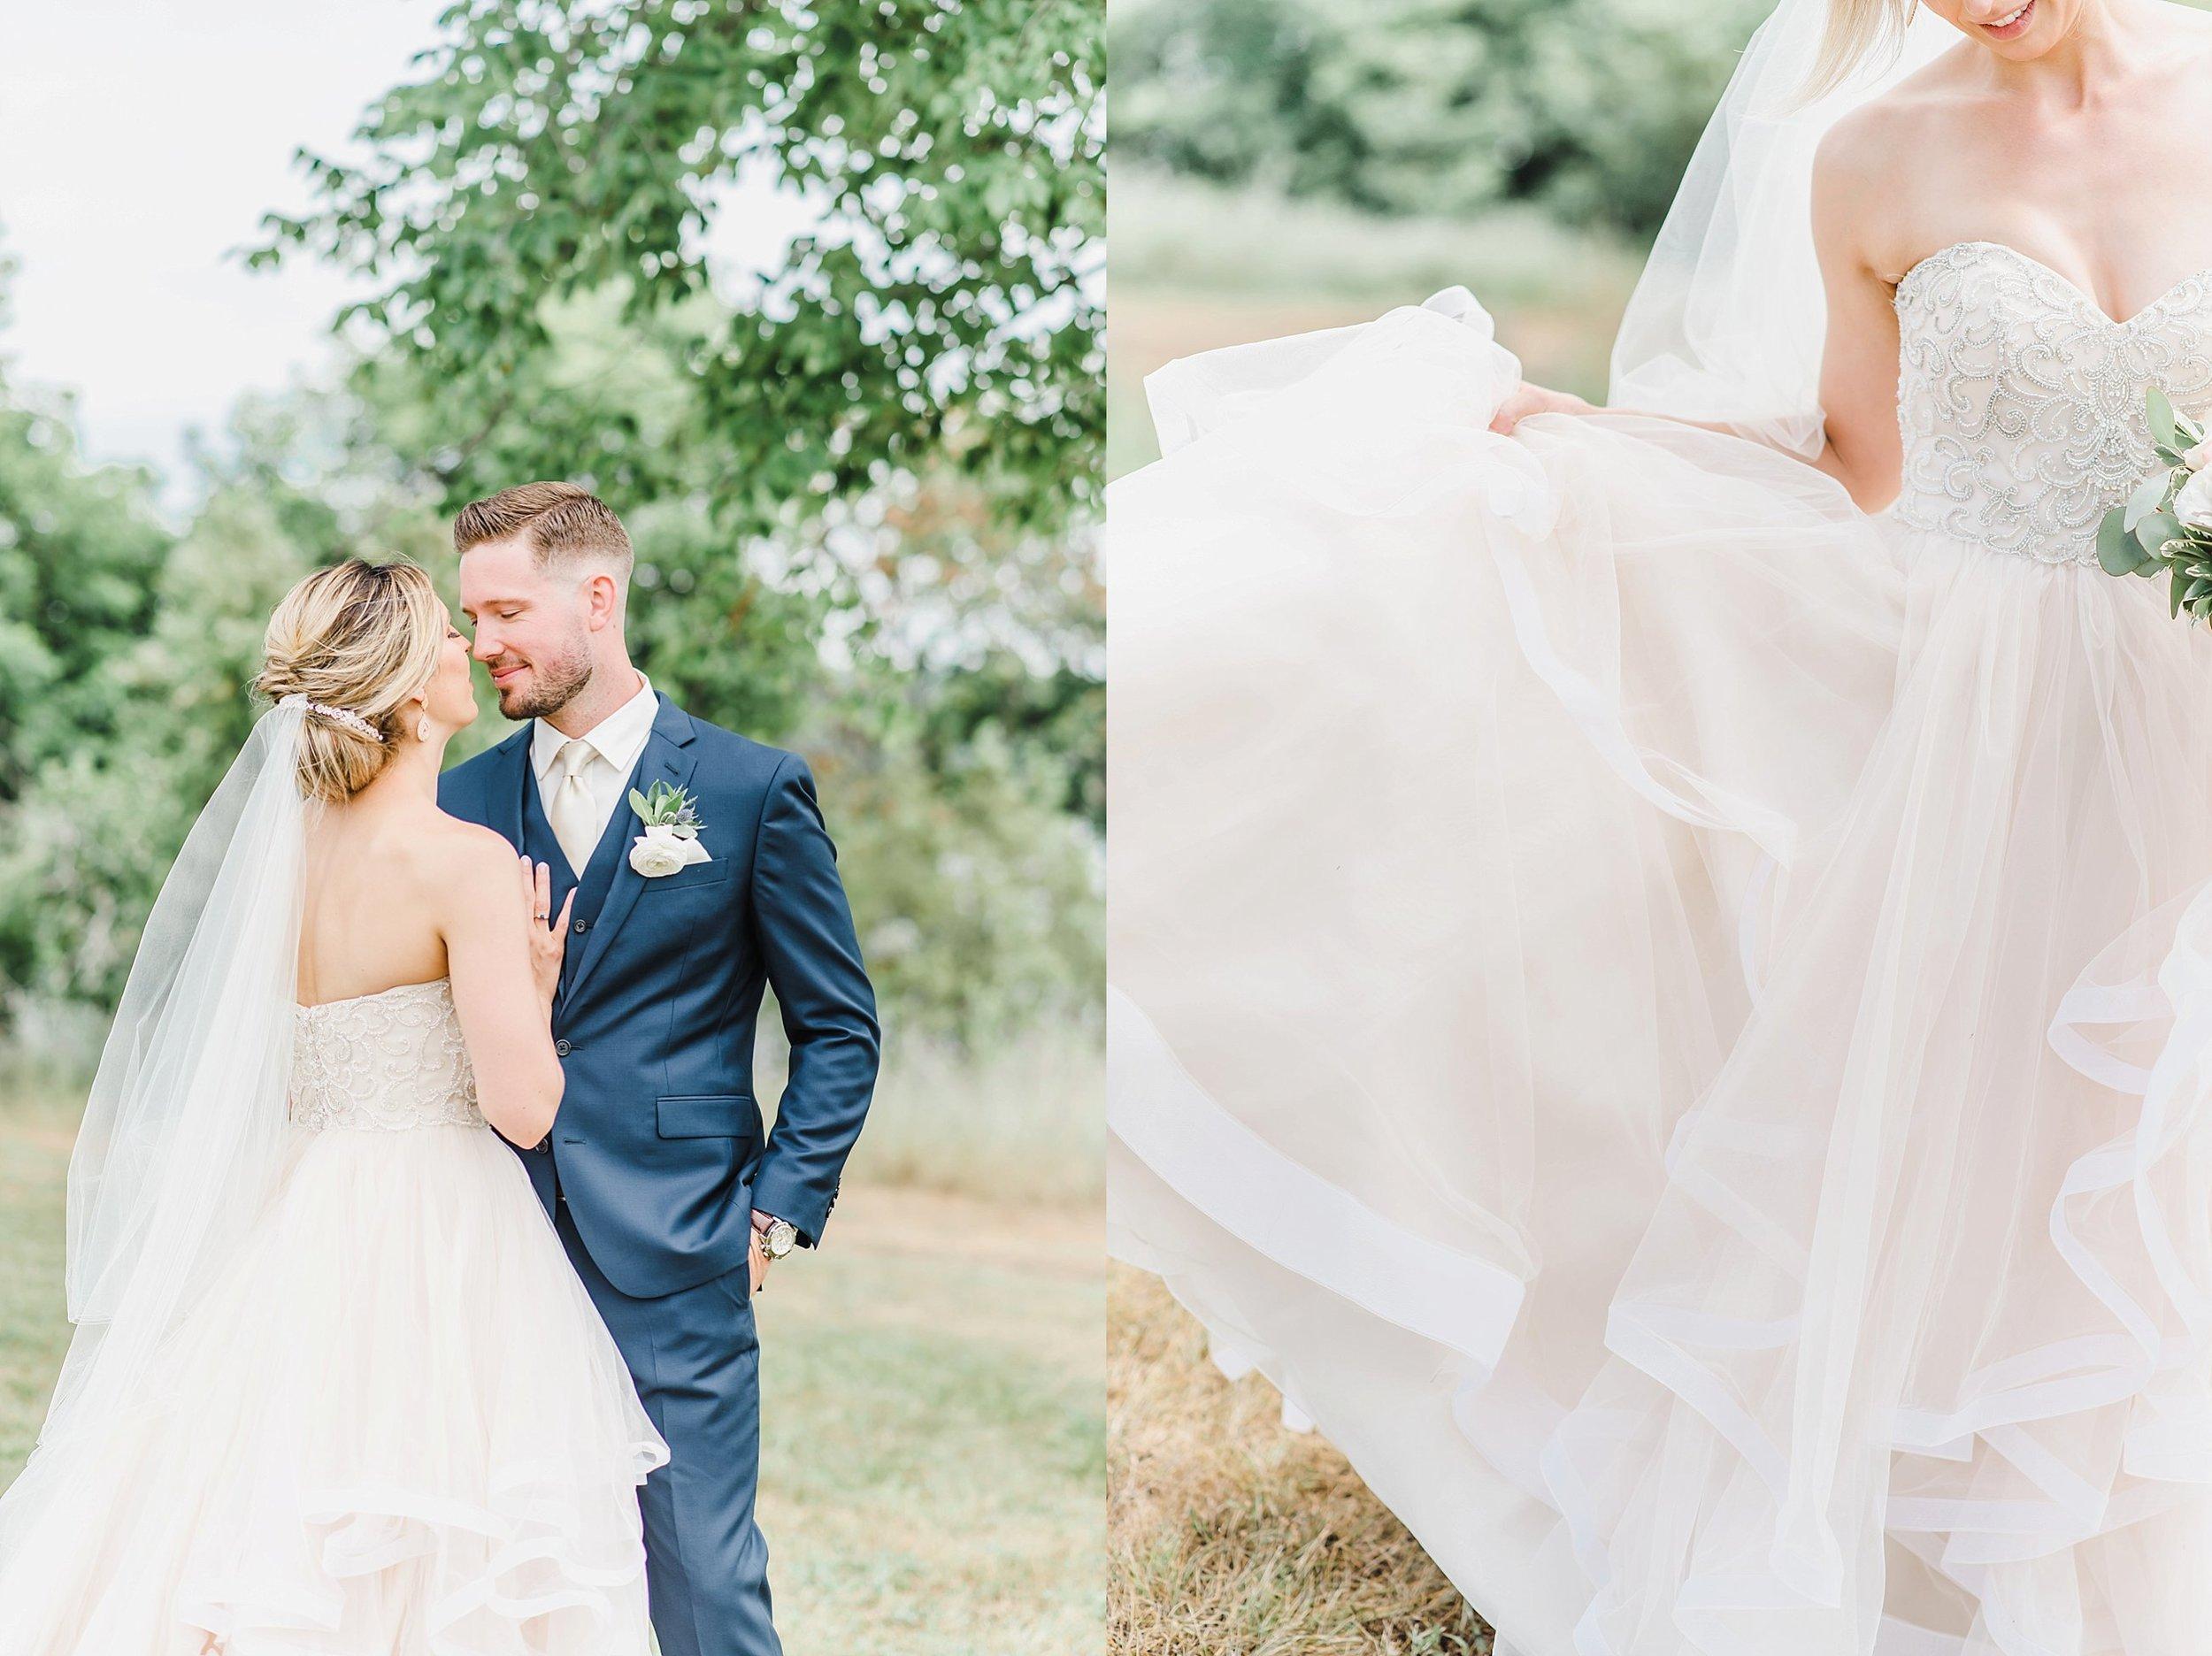 light airy indie fine art ottawa wedding photographer | Ali and Batoul Photography_0169.jpg